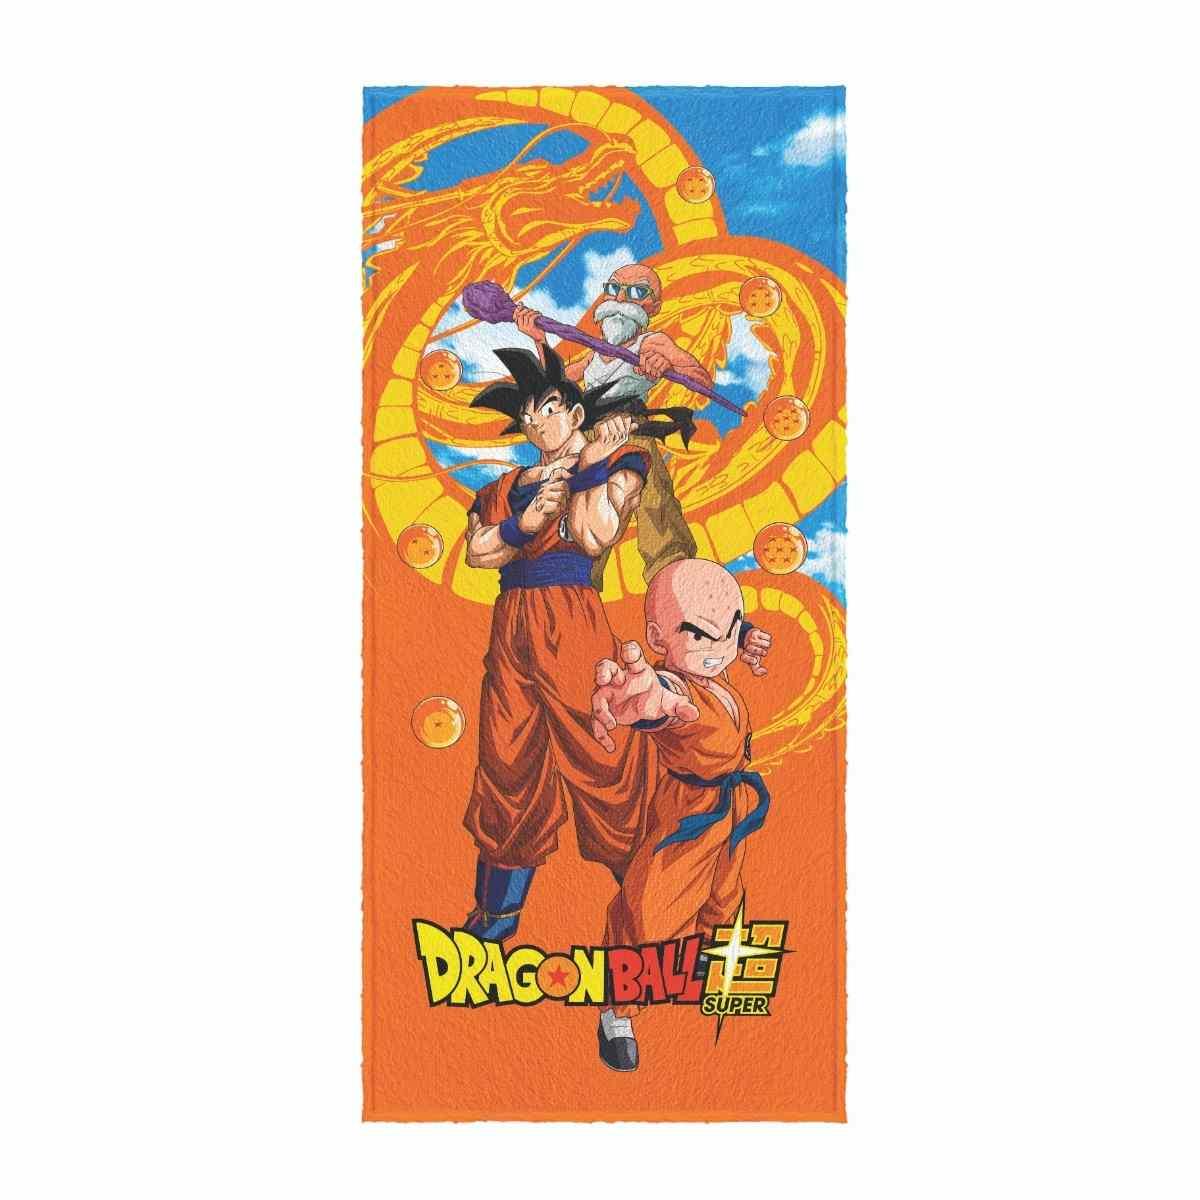 Toalha de Banho Infantil Felpuda 60x120 - Dragonball Est 5